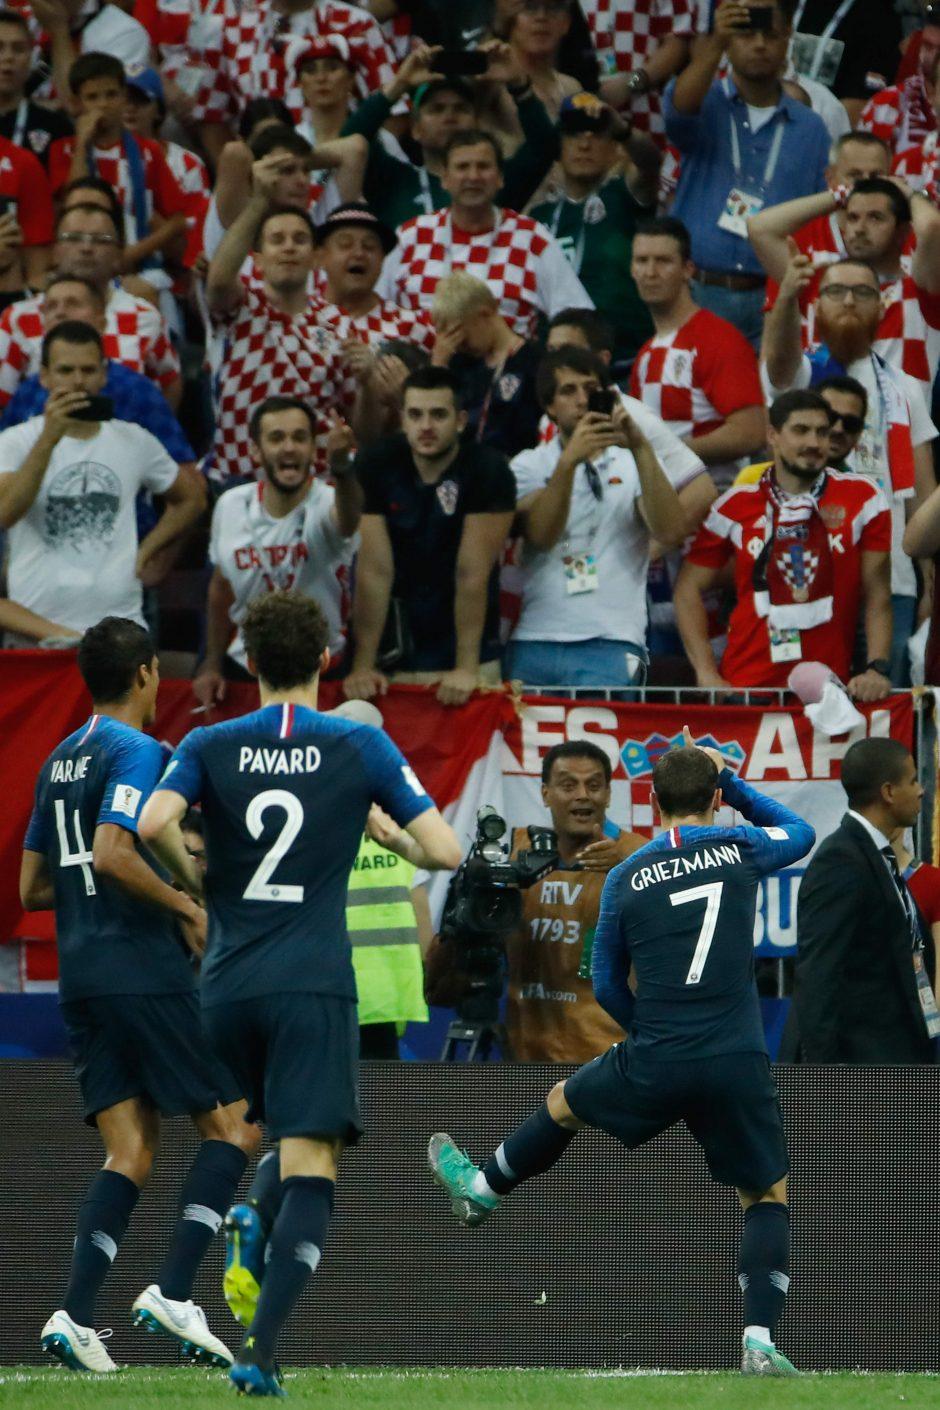 Pasaulio futbolo čempionato finalas: Prancūzija – Kroatija